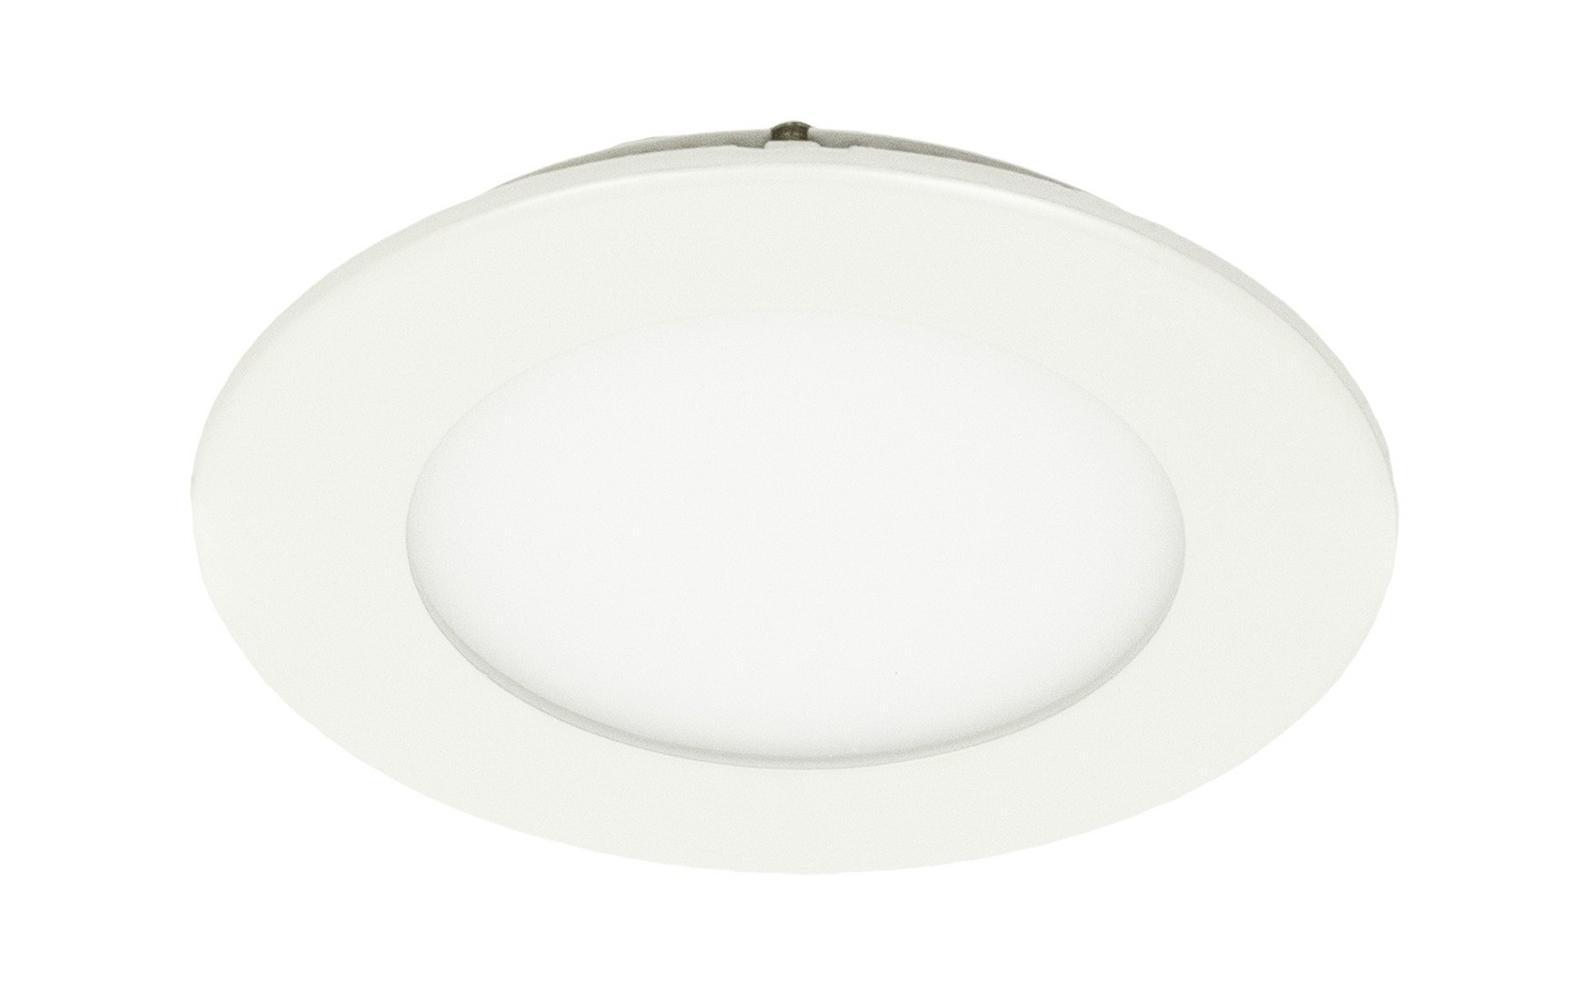 Светильник встраиваемый Arte lamp Fine a2606pl-1wh arte lamp встраиваемый светильник arte lamp fine a2612pl 1wh